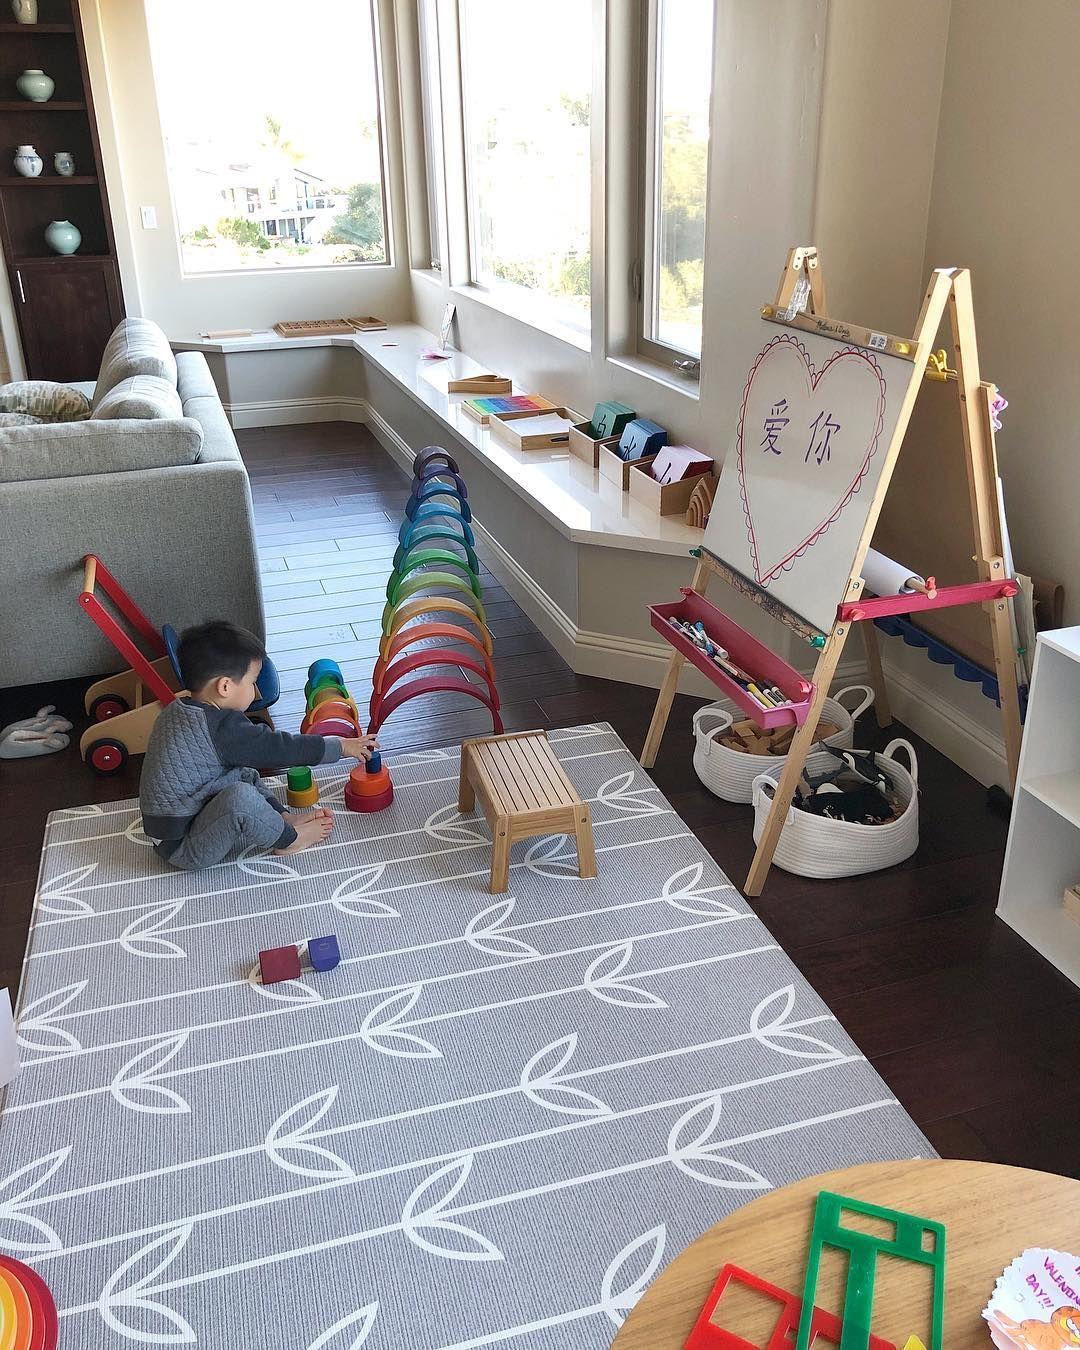 Organized Modern Play Room Kids Rugs Playroom Baby Play Areas #play #area #ideas #living #room